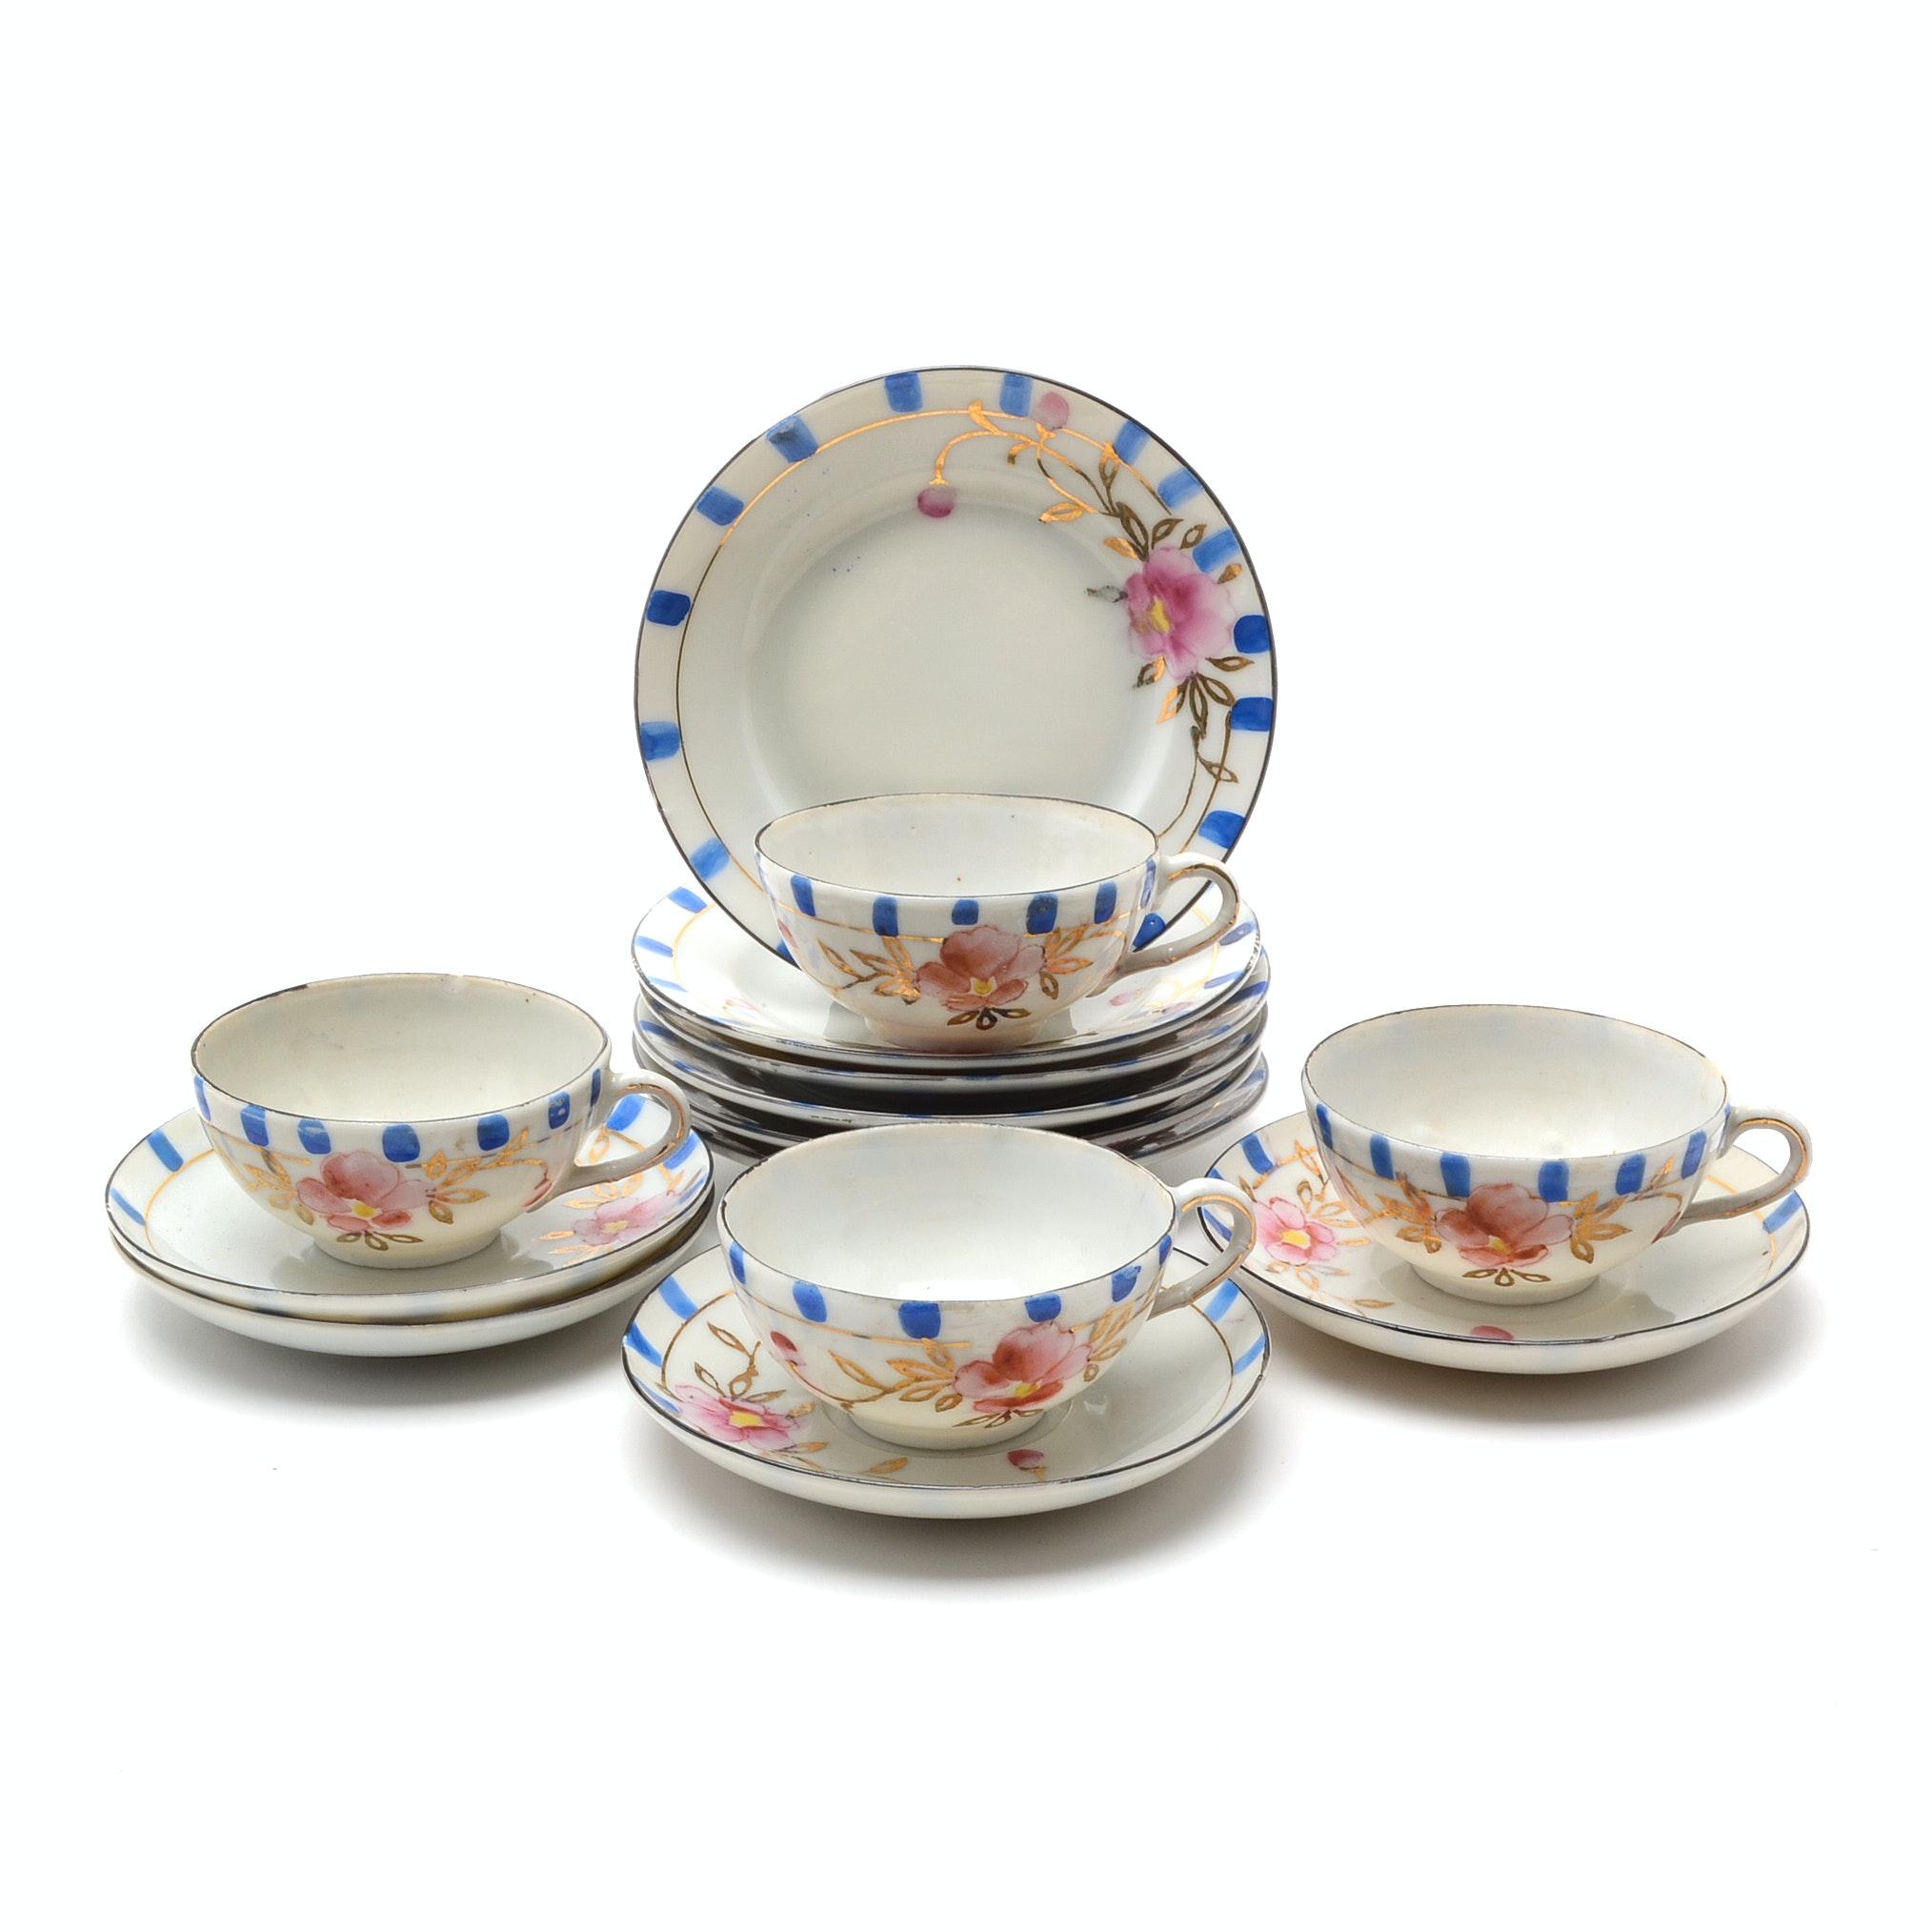 Vintage Child's Size Porcelain Teacups, Saucers and Plates